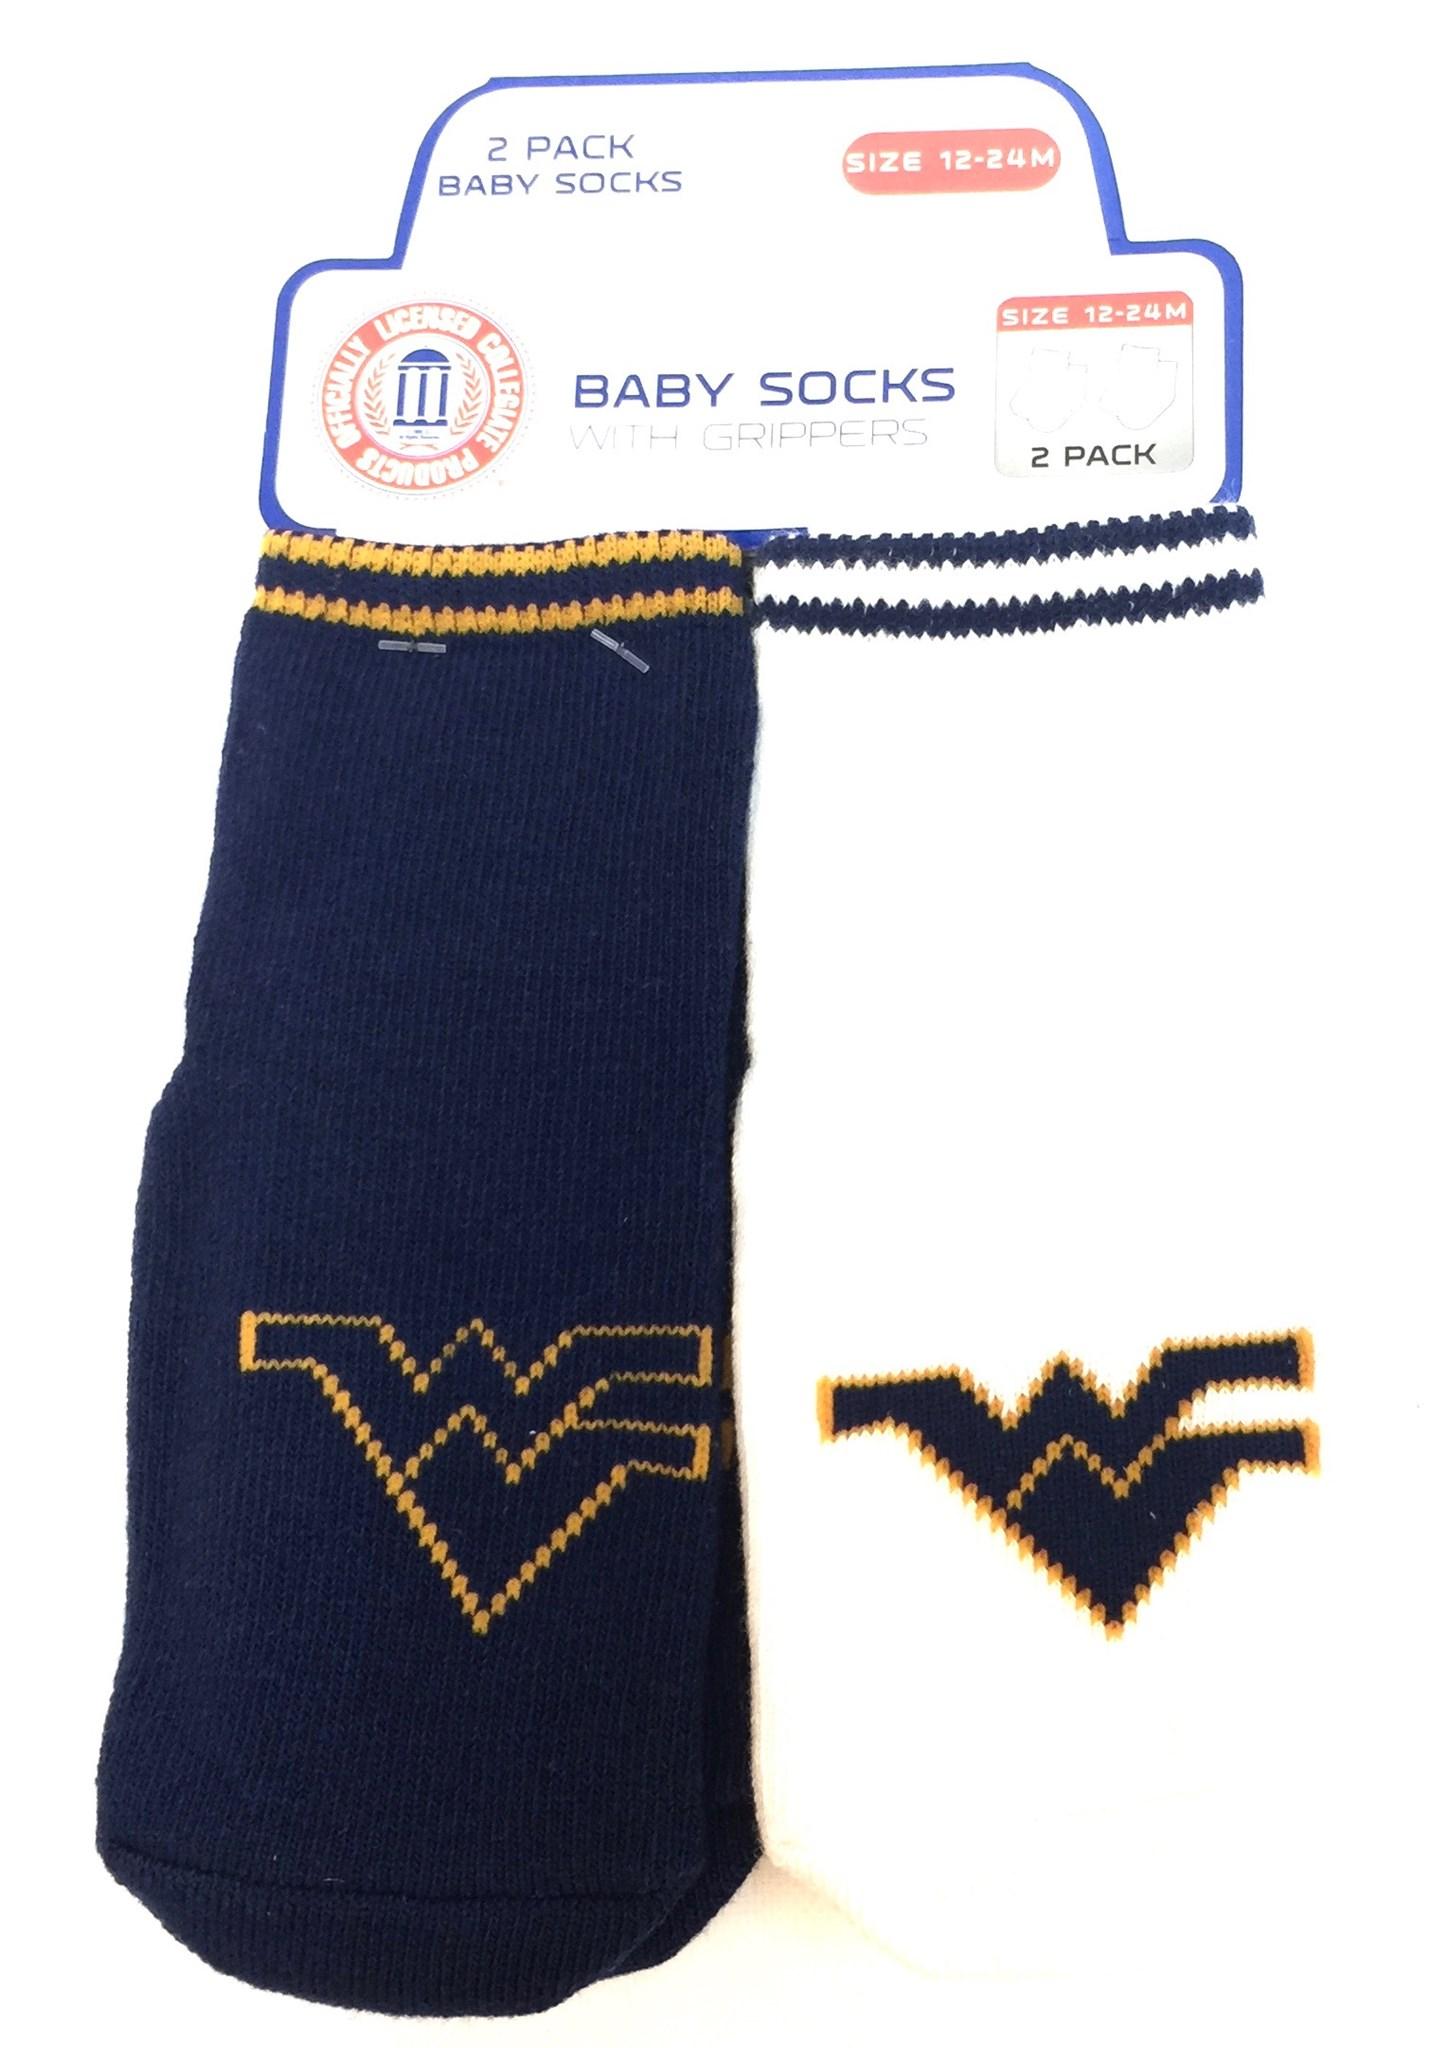 Carded 2 Pk Baby Socks w/Grippers - Virginia